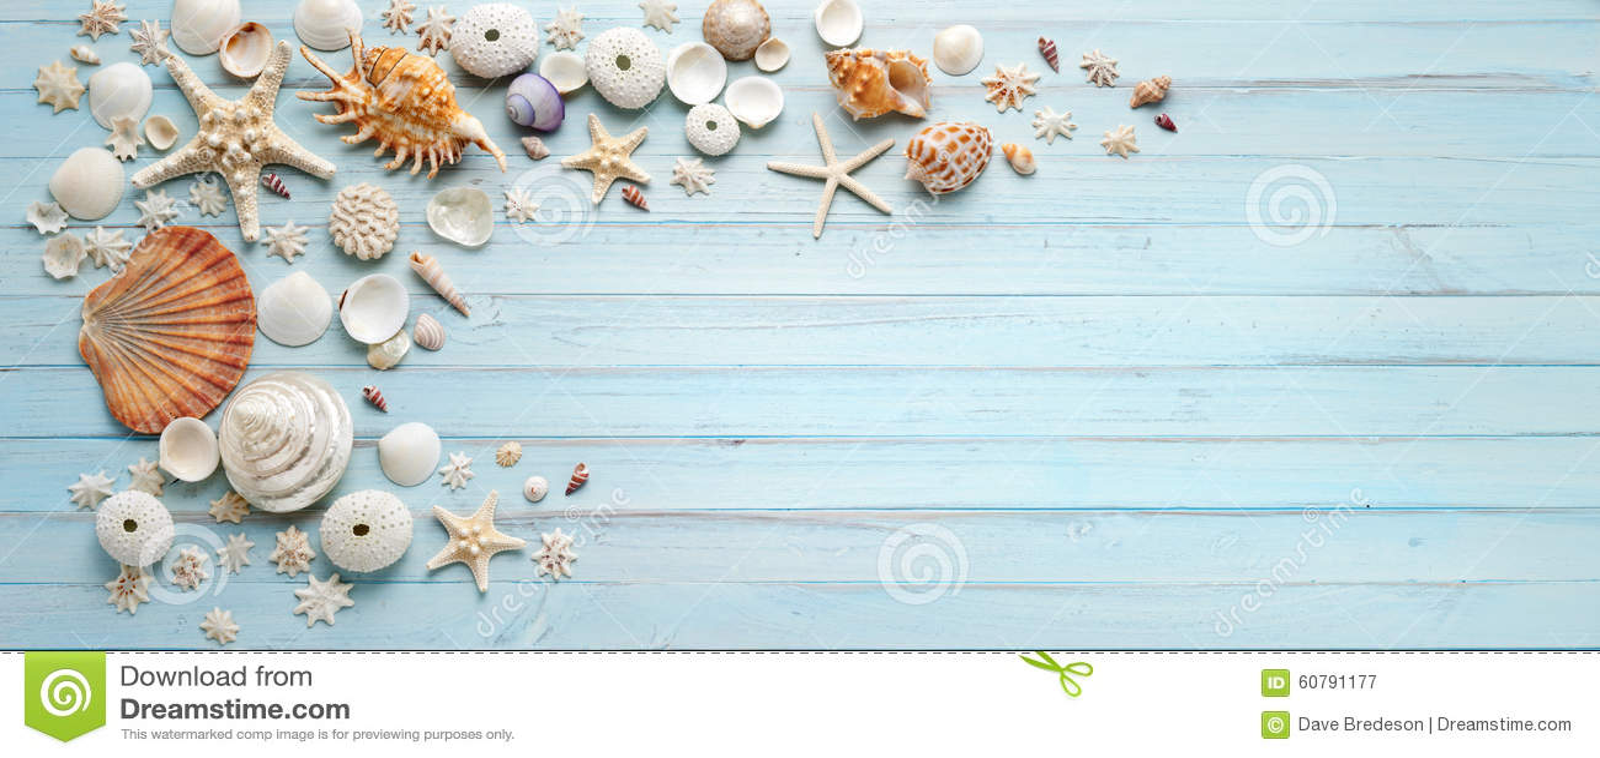 3d Grey Brick Effect Wallpaper Summer Shells Blue Wood Banner Background Stock Image